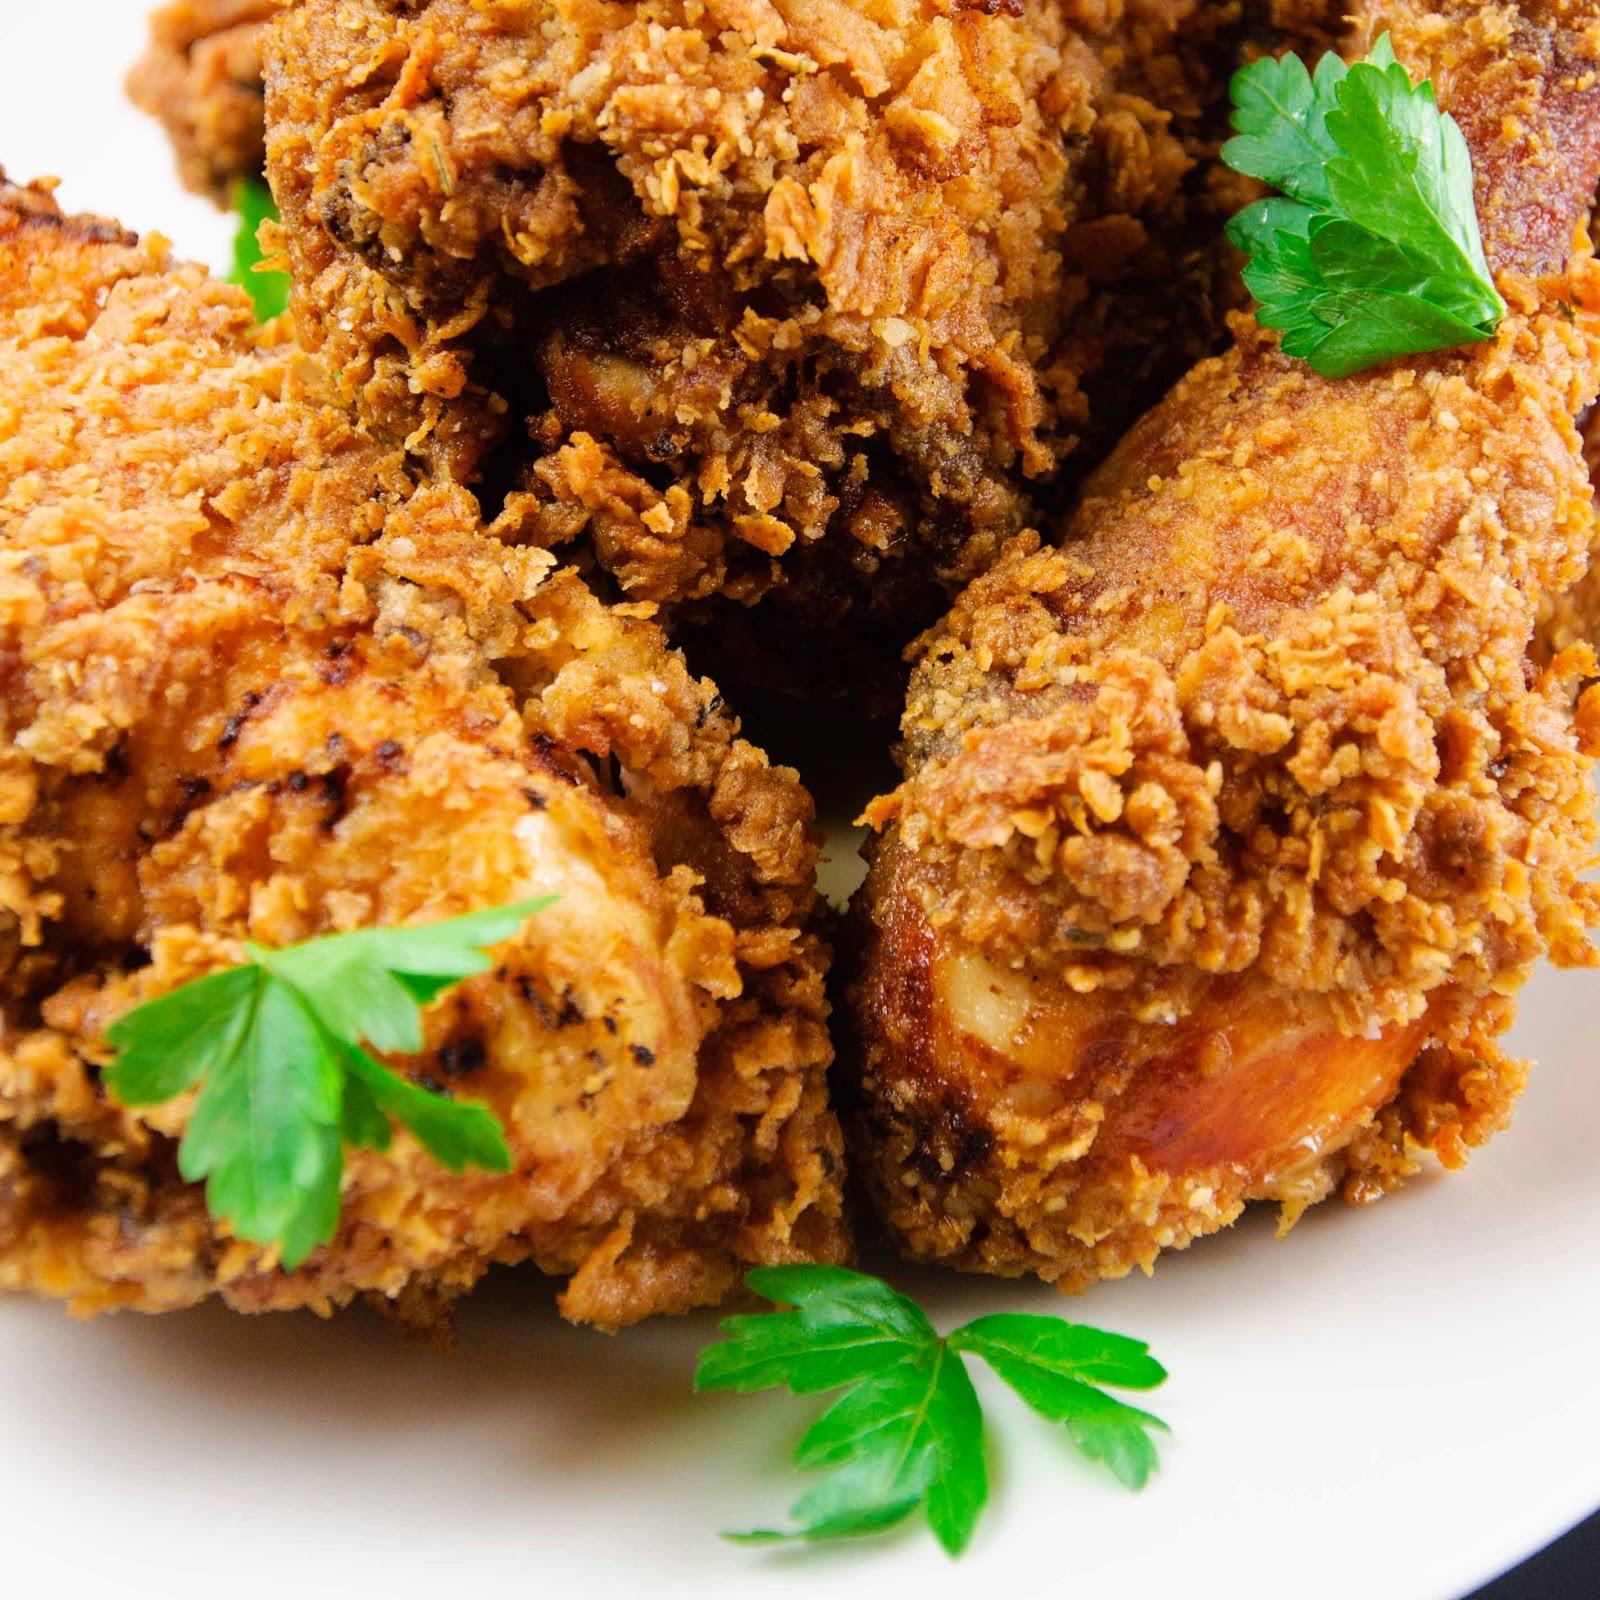 BEST FOOD RECIPES: Buttermilk Fried Chicken